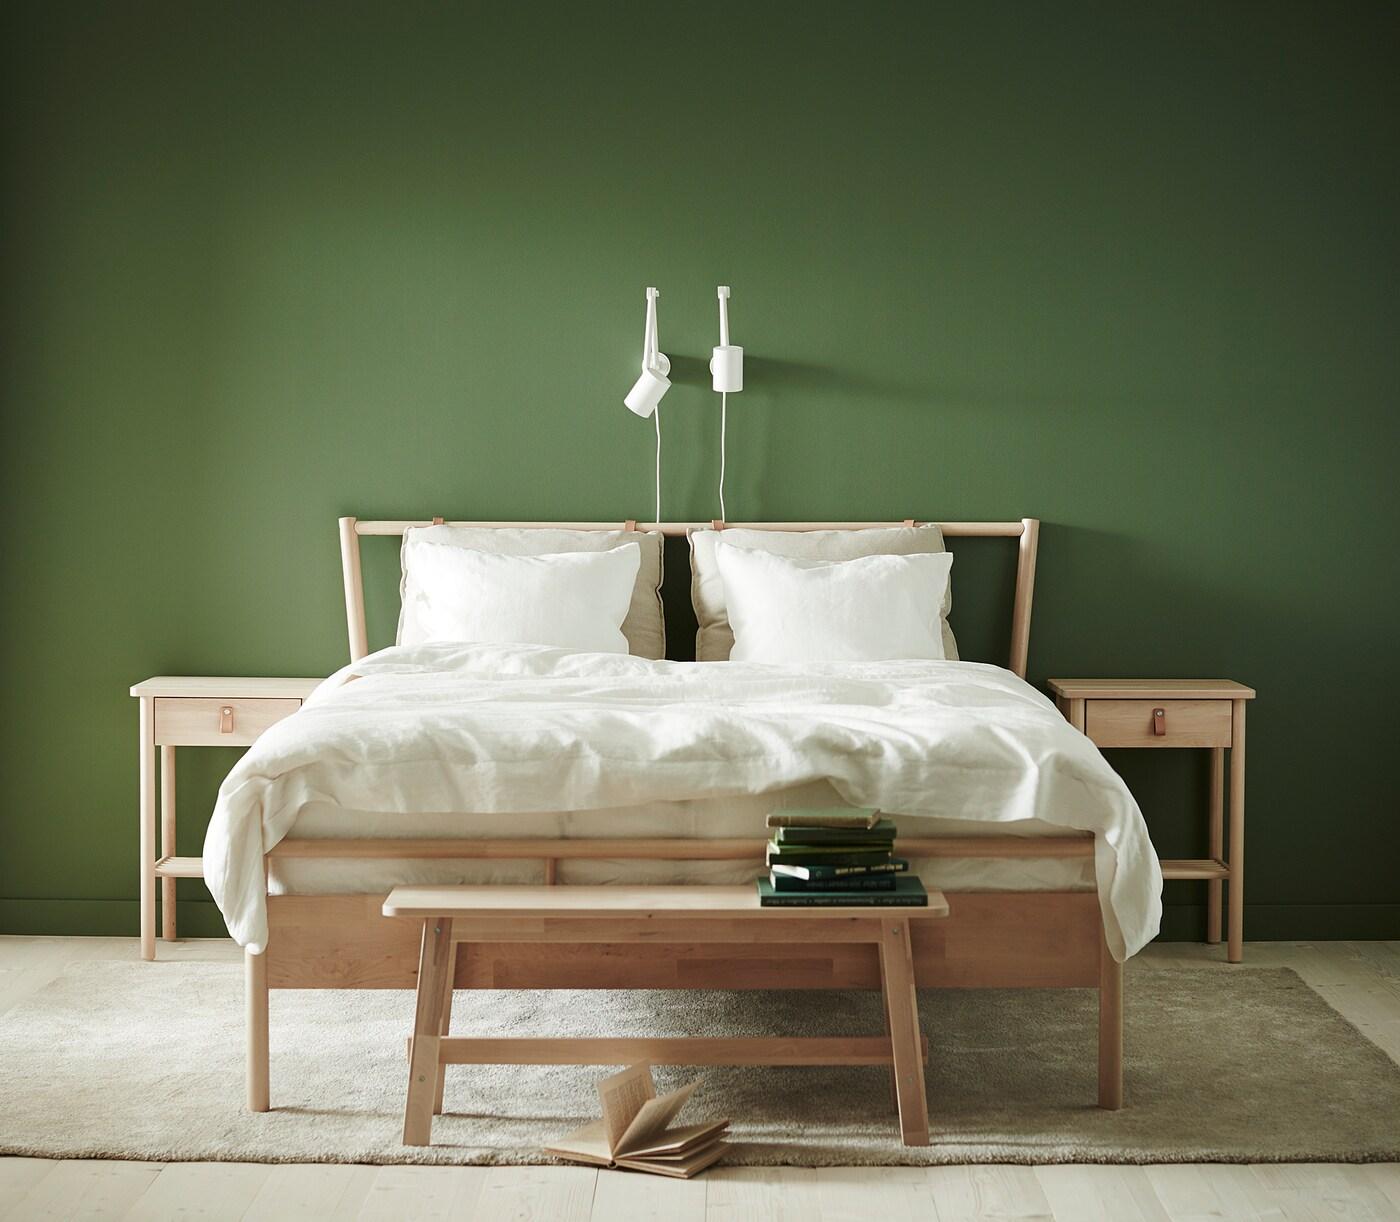 TYVELSE Matta, kort lugg, off white, 200x300 cm IKEA